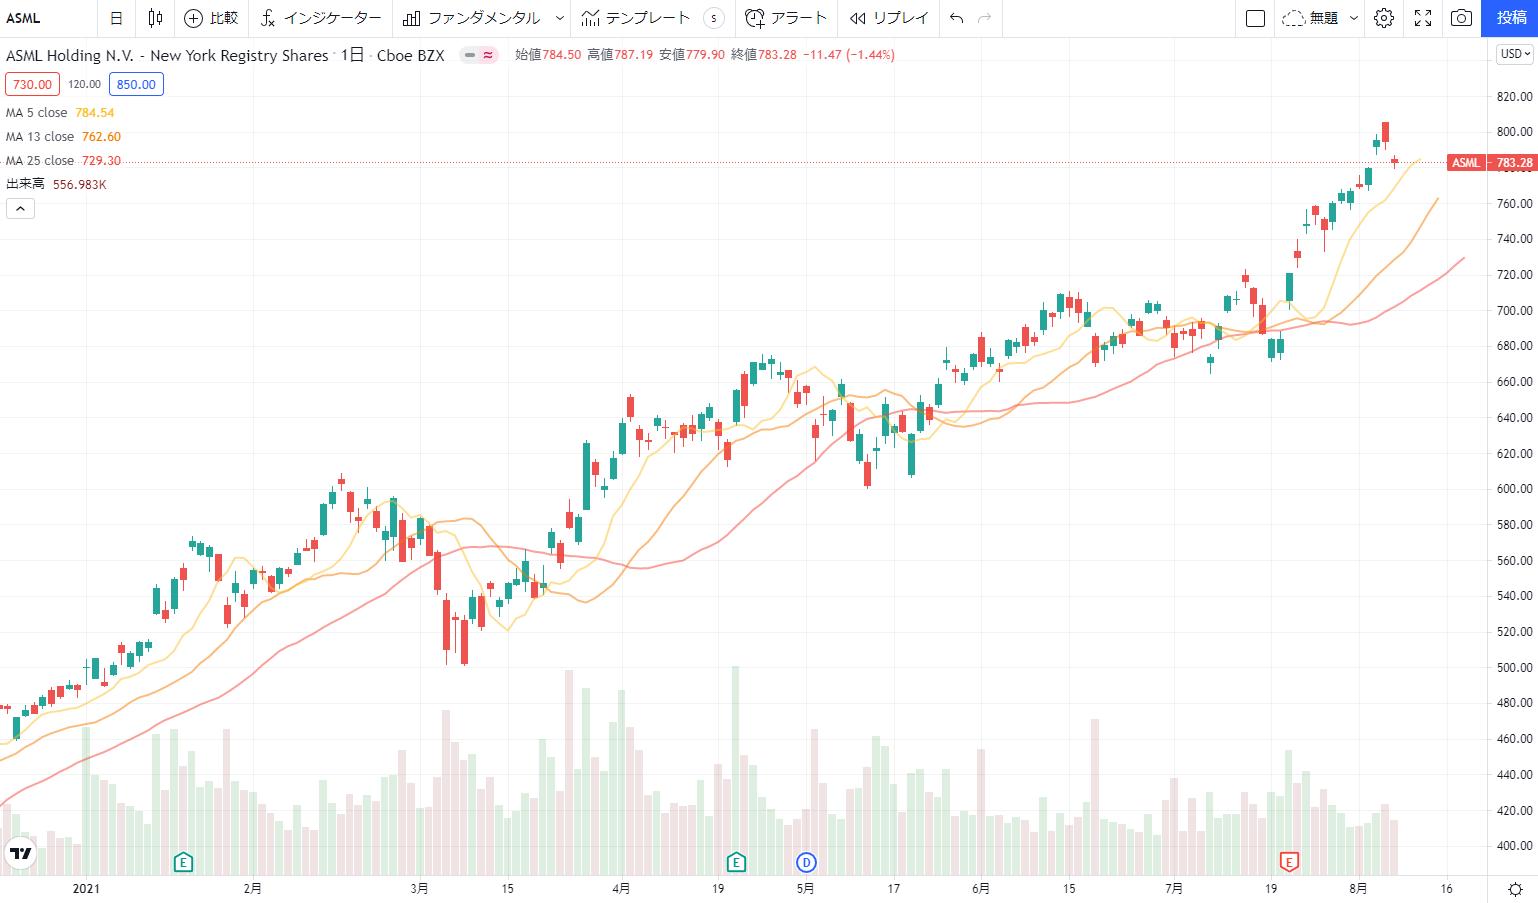 ASMLの株価チャート、推移(日足)